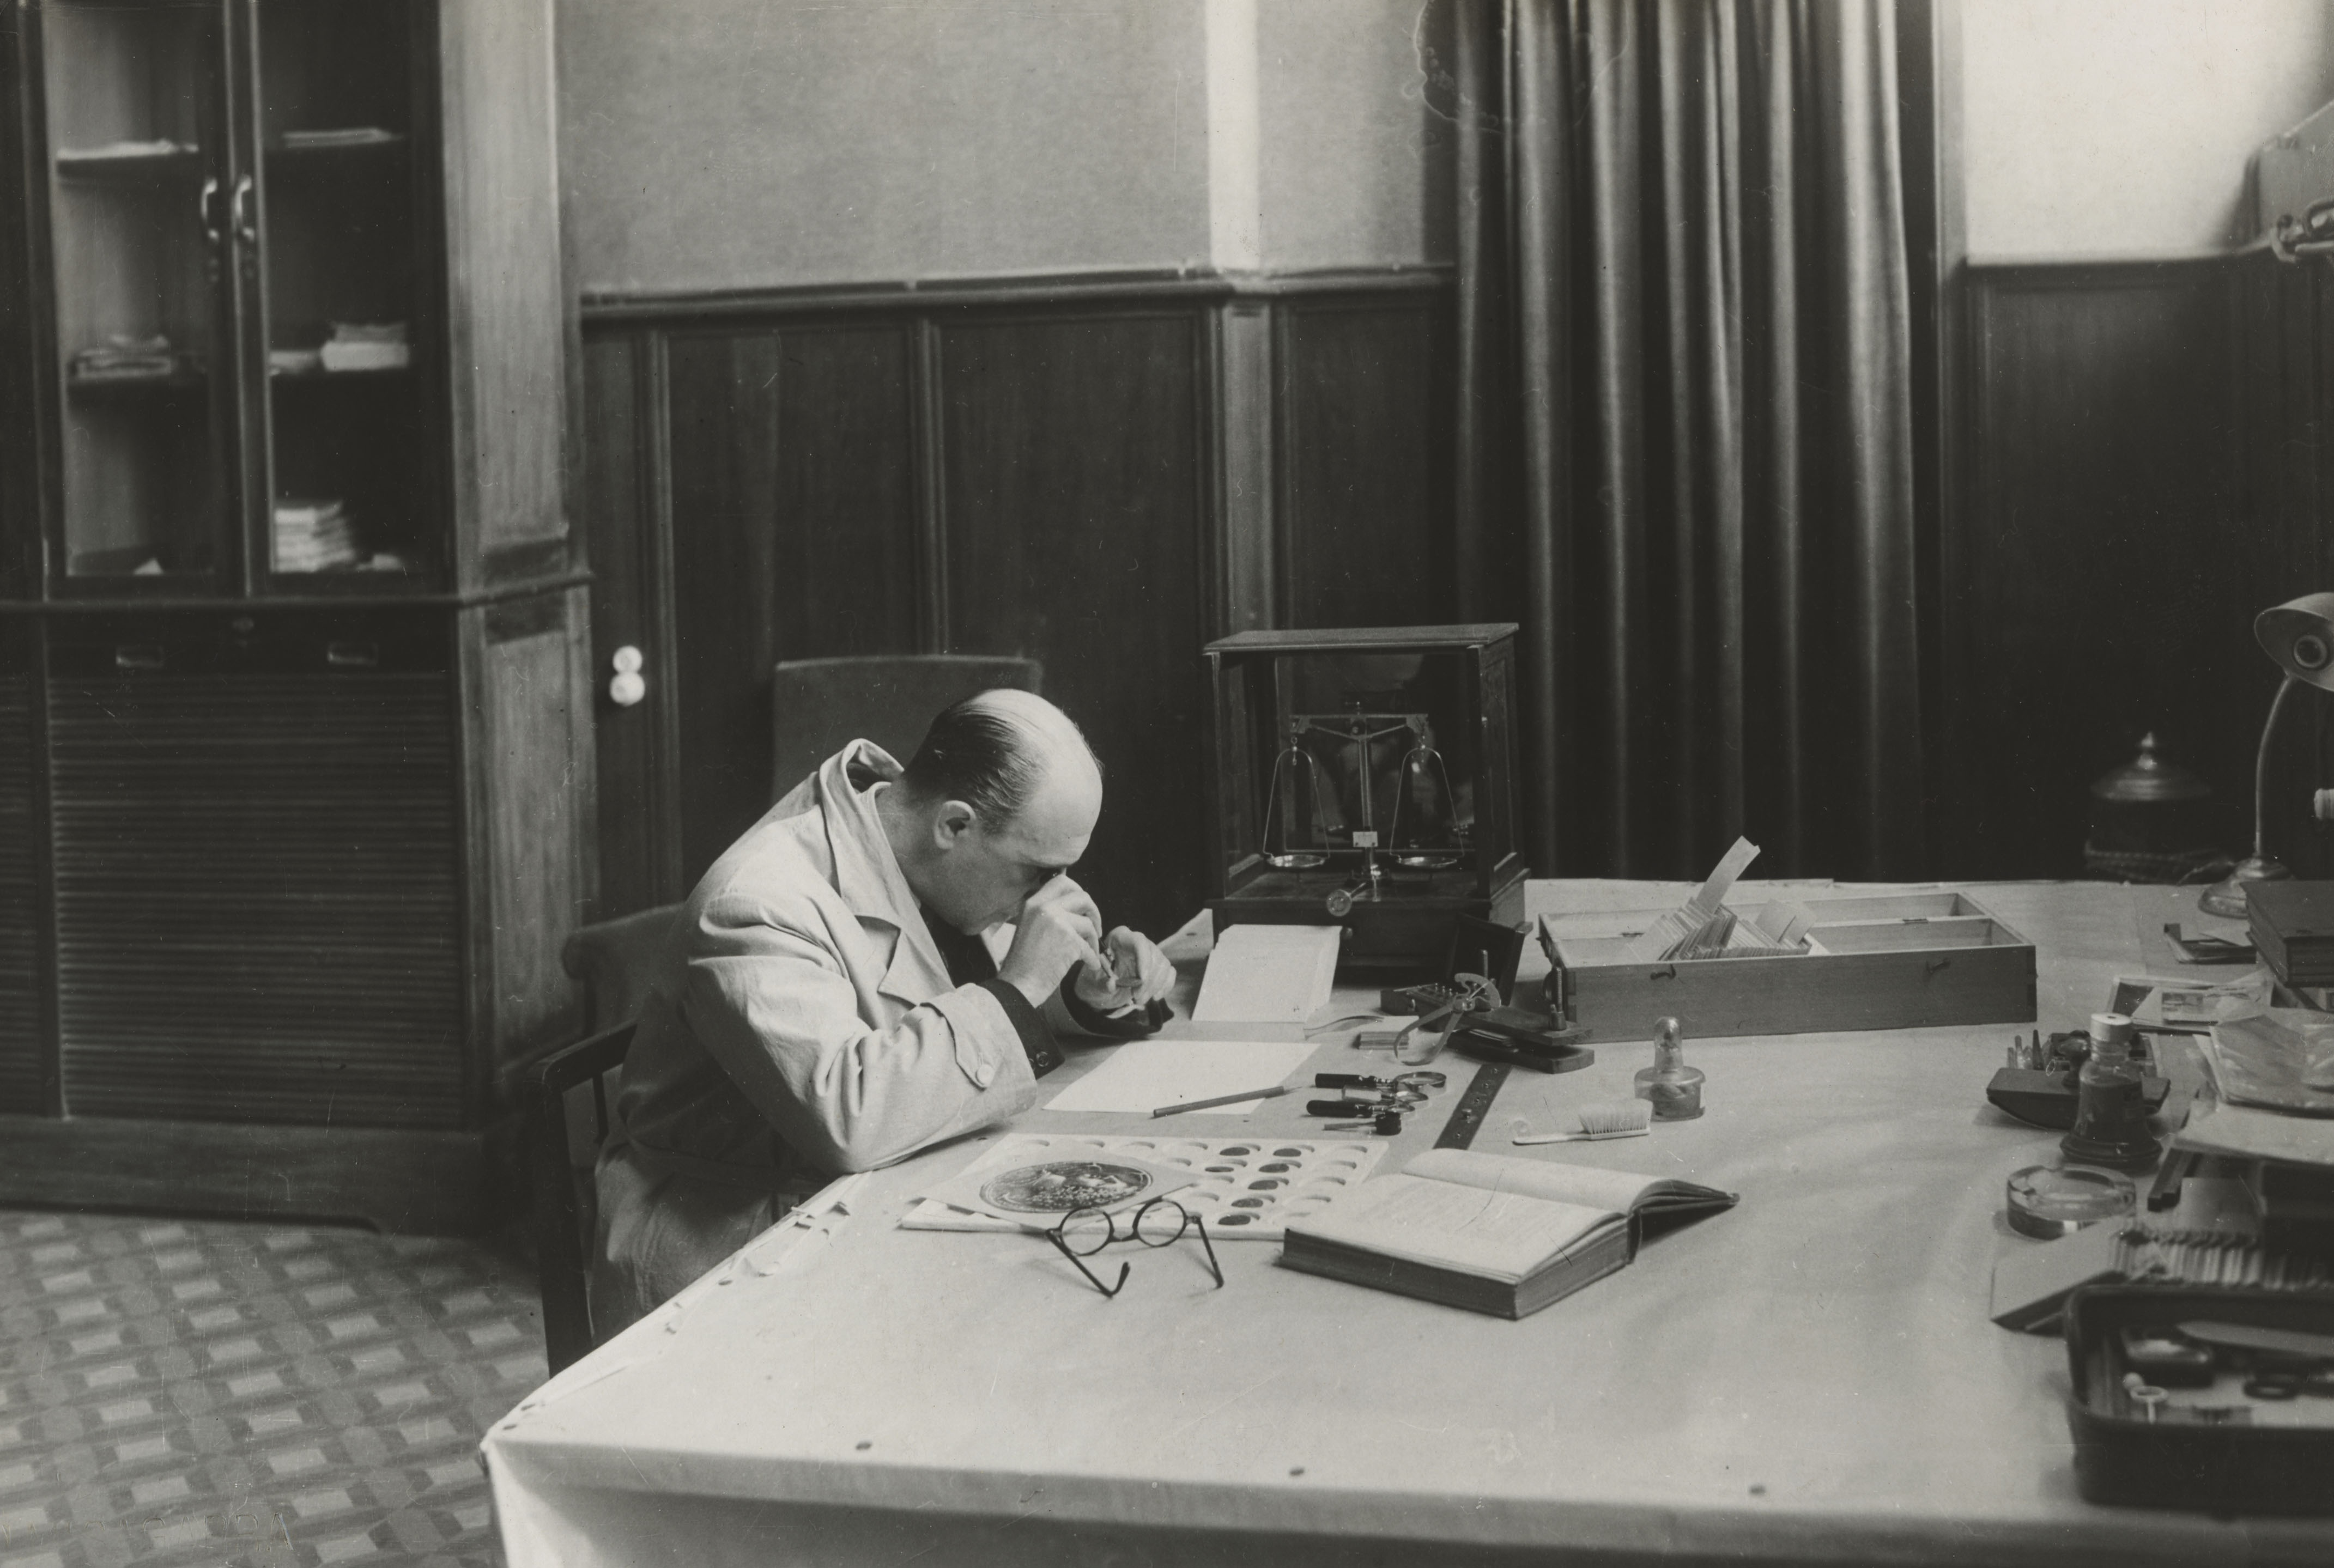 Josep Amorós (1887-1970)